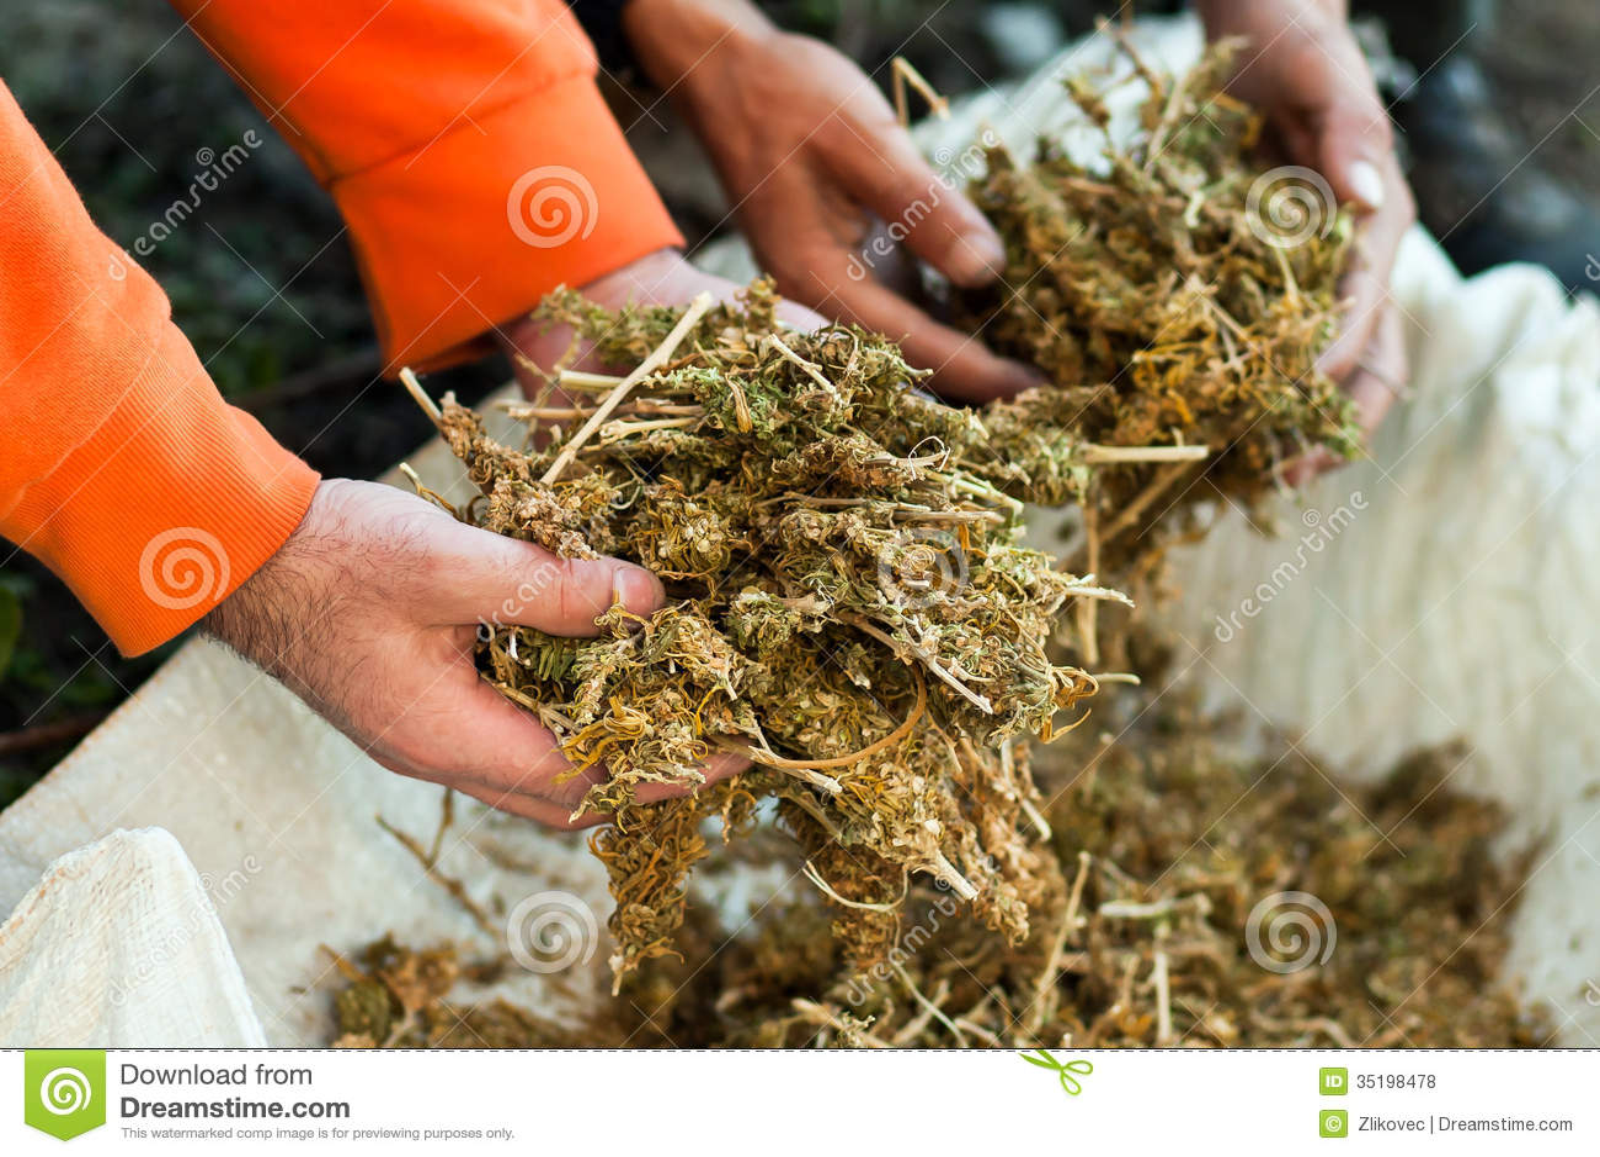 marijuana stock photo image of sorting  separation  leaf marijuana leaf vector silhouette free marijuana leaf vector hd